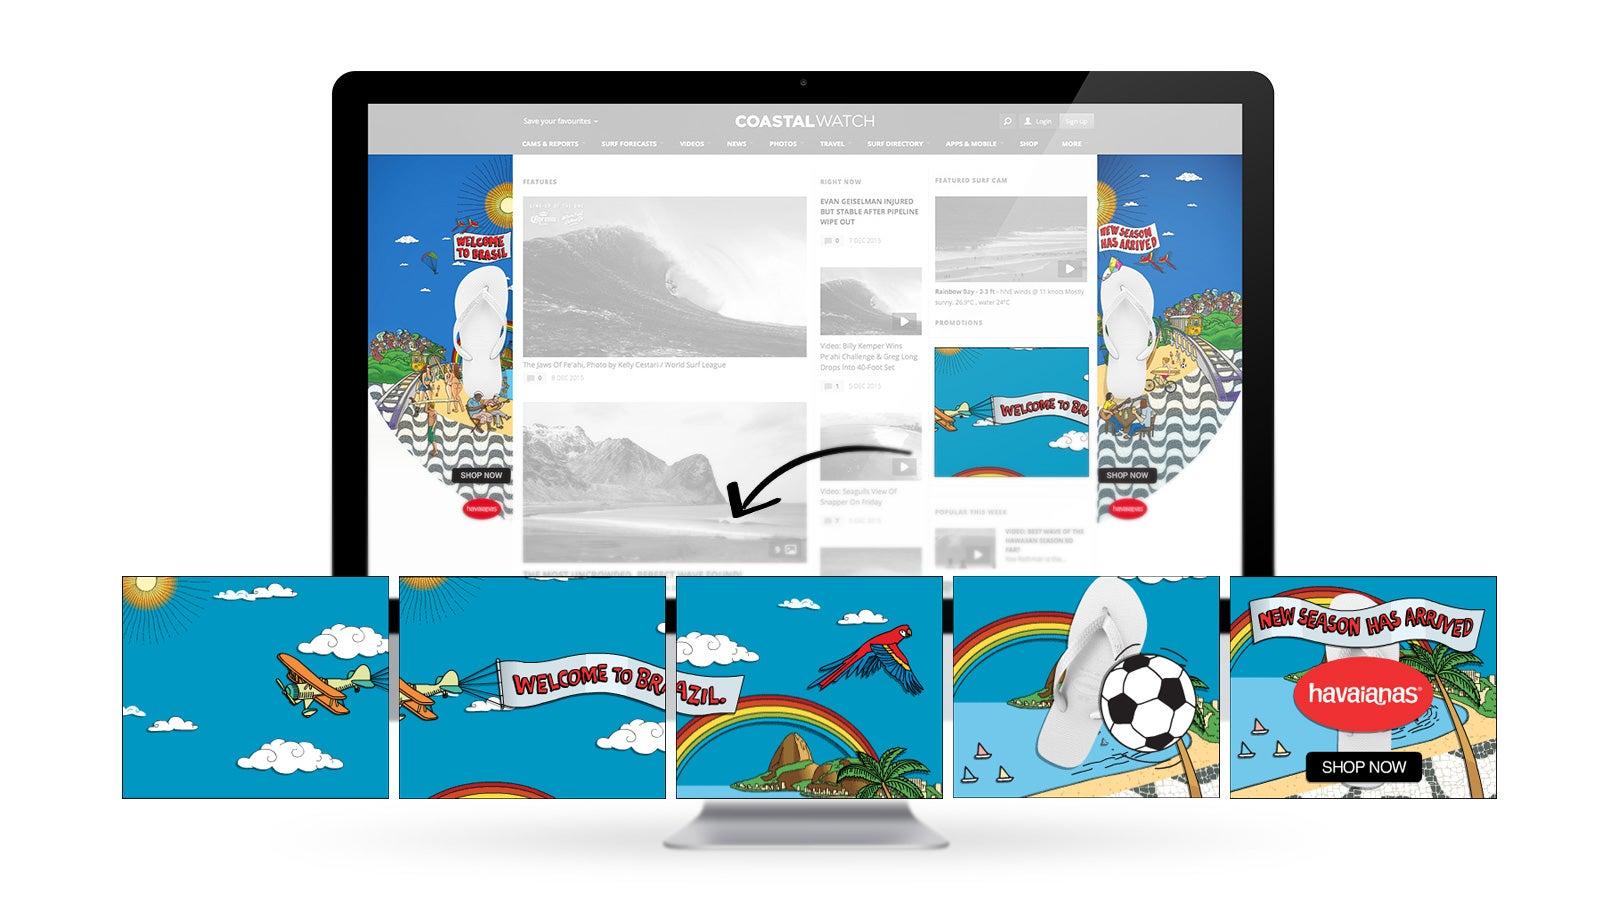 Havaianas | social media marketing images | Devotion